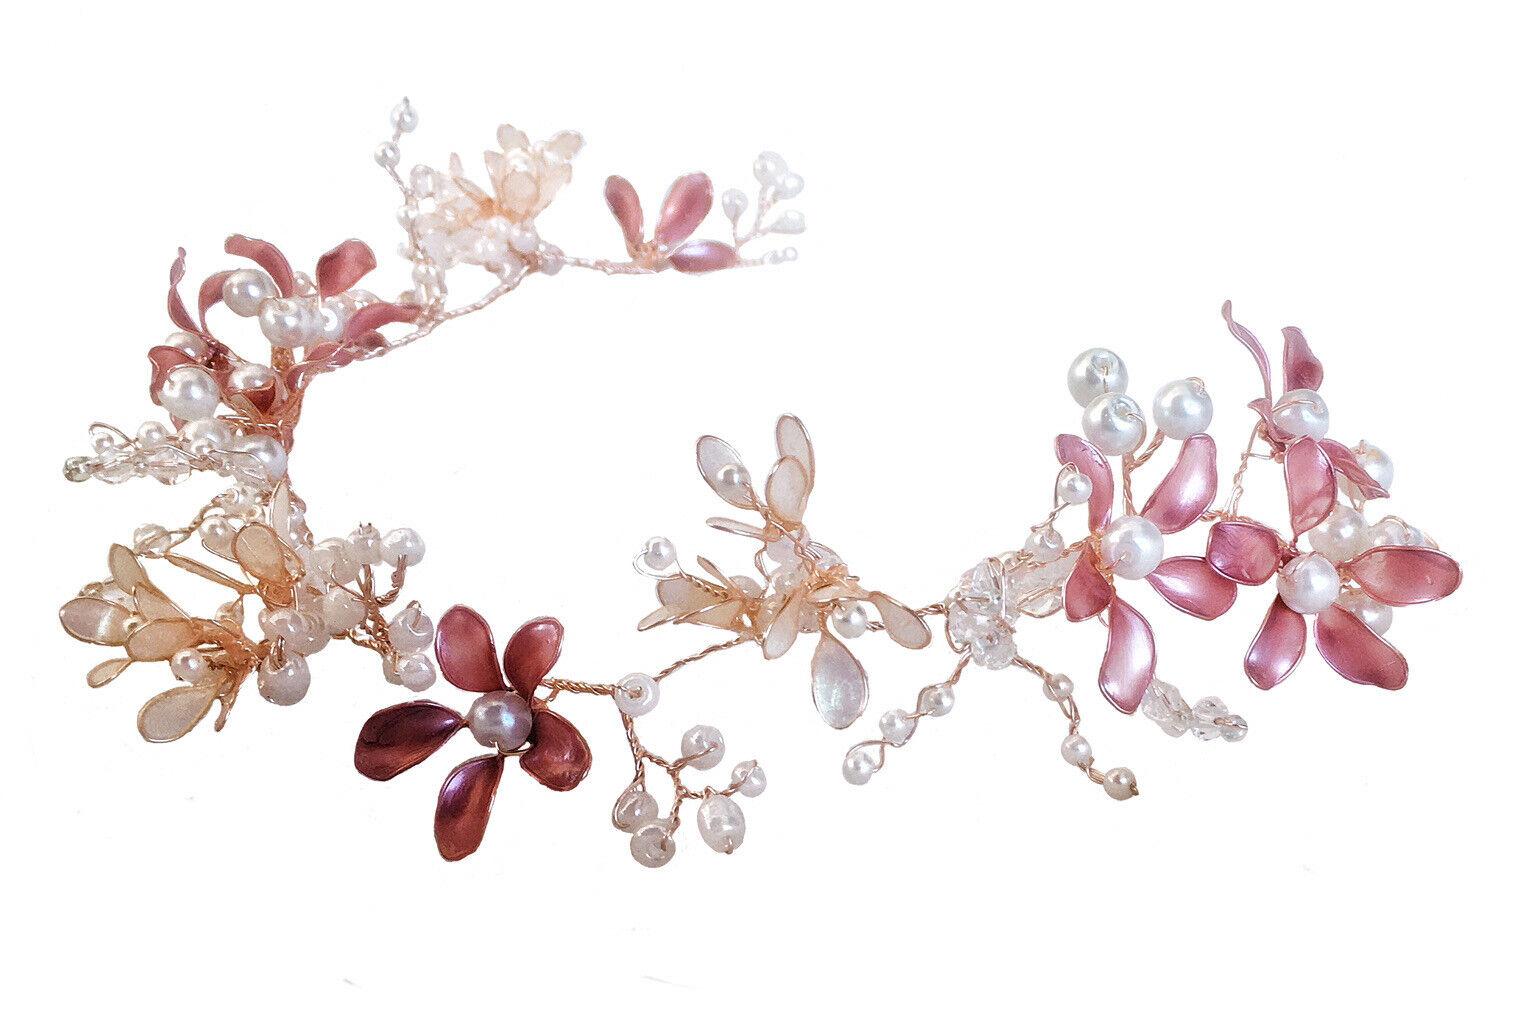 Bridal Hair Vine Cherry Blossom, Woodland Rustic Wedding, Rose Gold, Boho, Prom